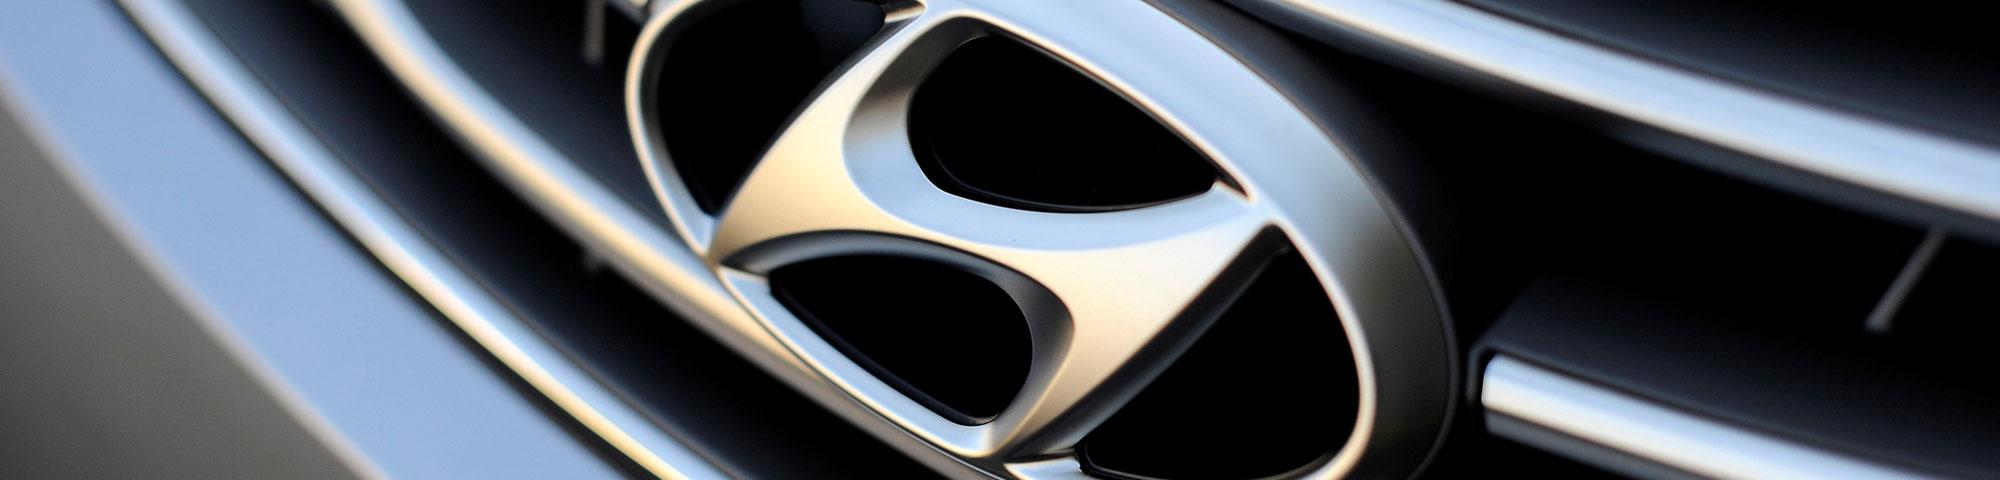 CLMS - Manufacturer - Hyundai